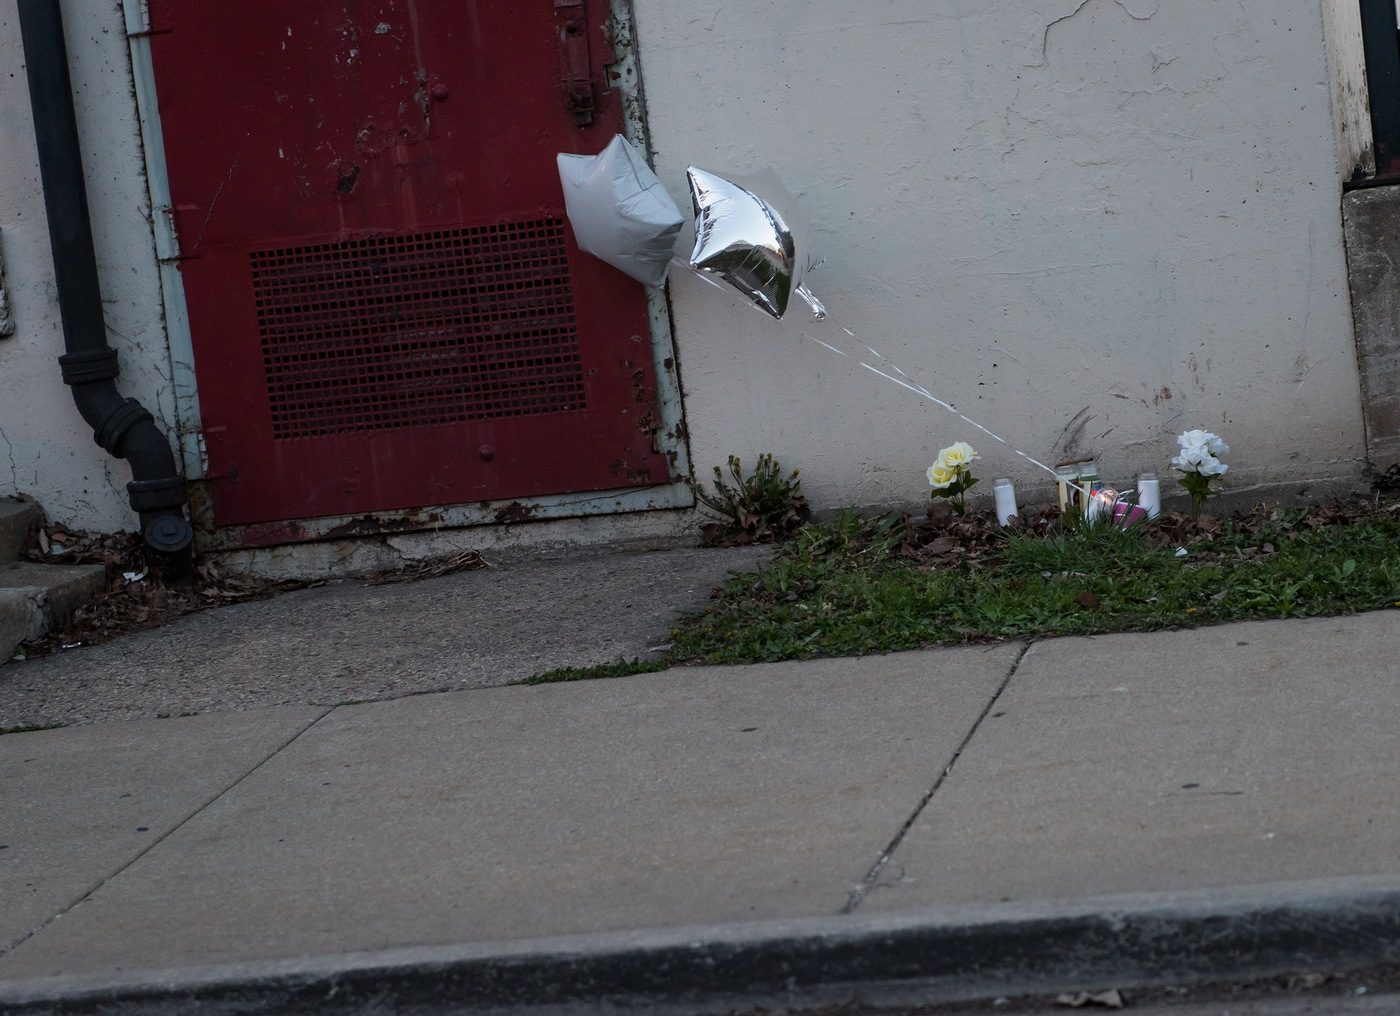 Roadside Memorial in Chicago